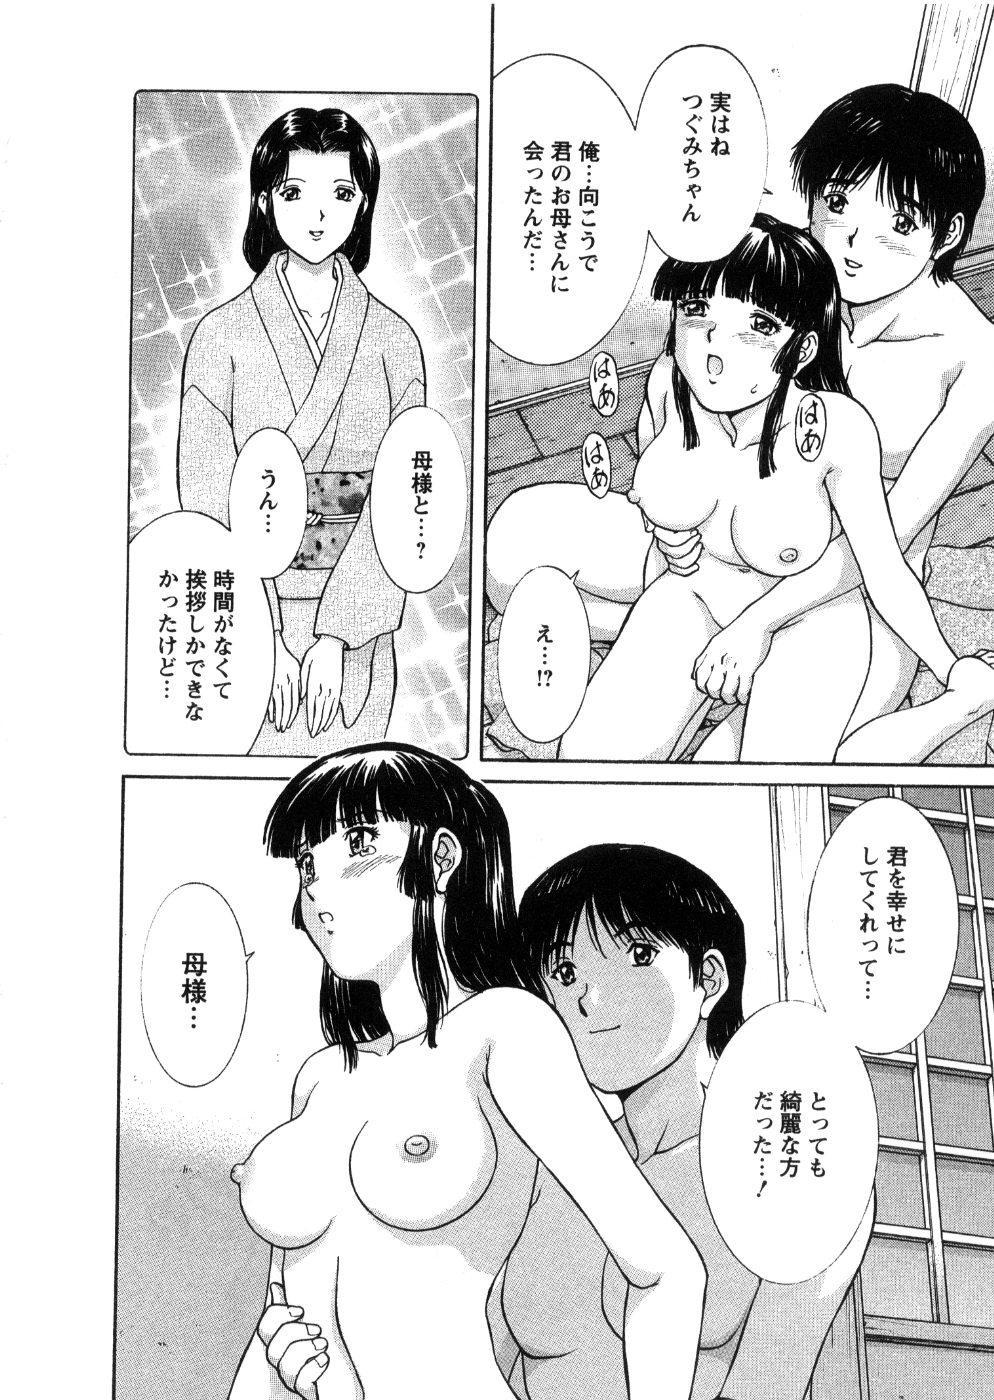 Oneechan-tachi ga Yatte Kuru 03 65